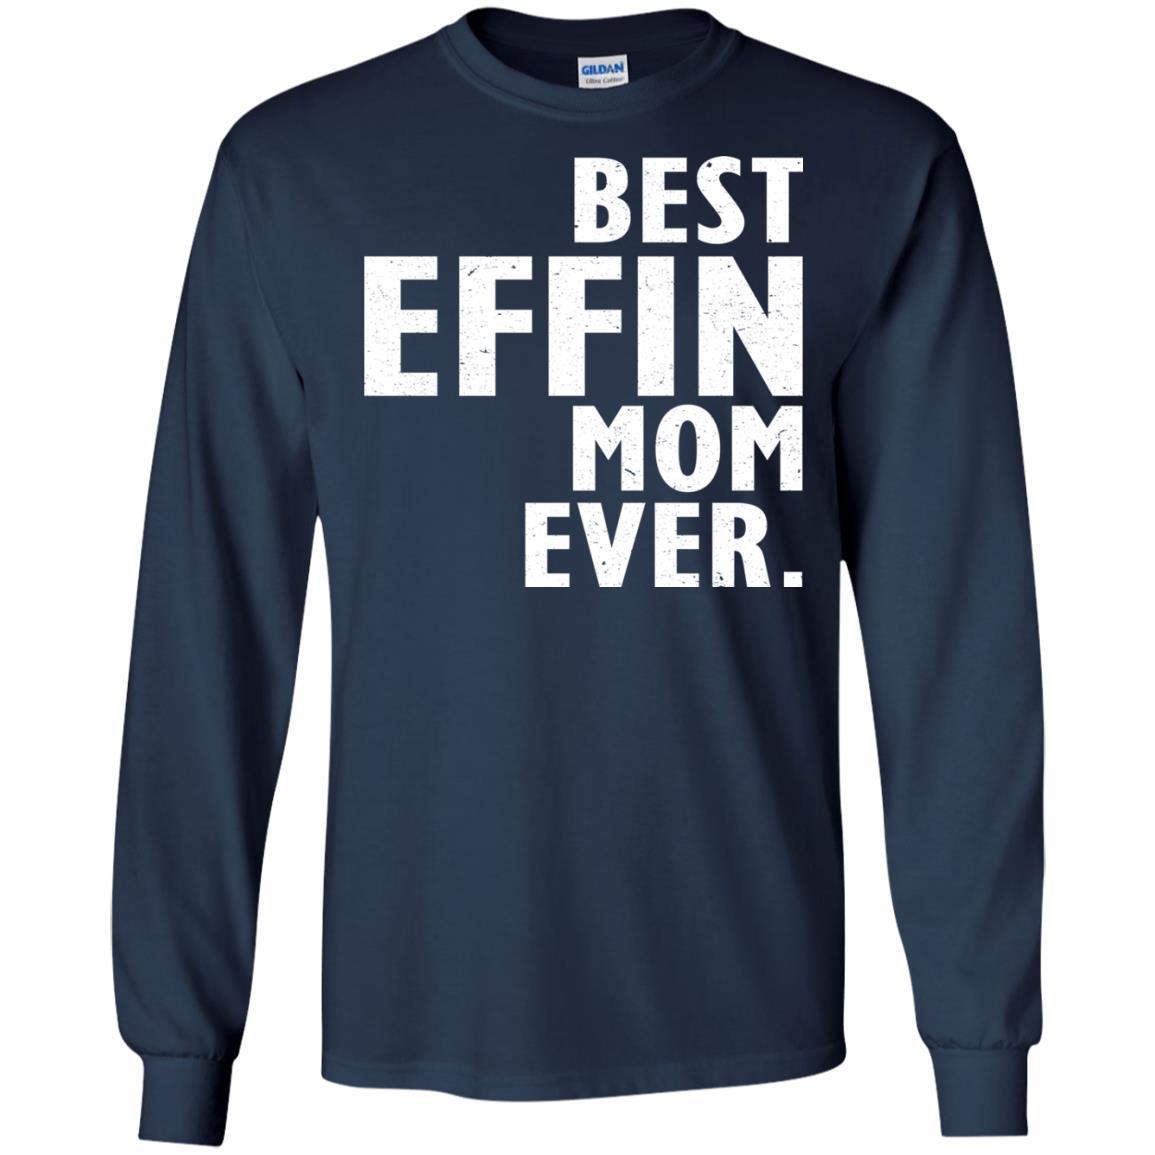 image 373 - Best Effin Mom Ever Shirt, Sweatshirt, Hoodie